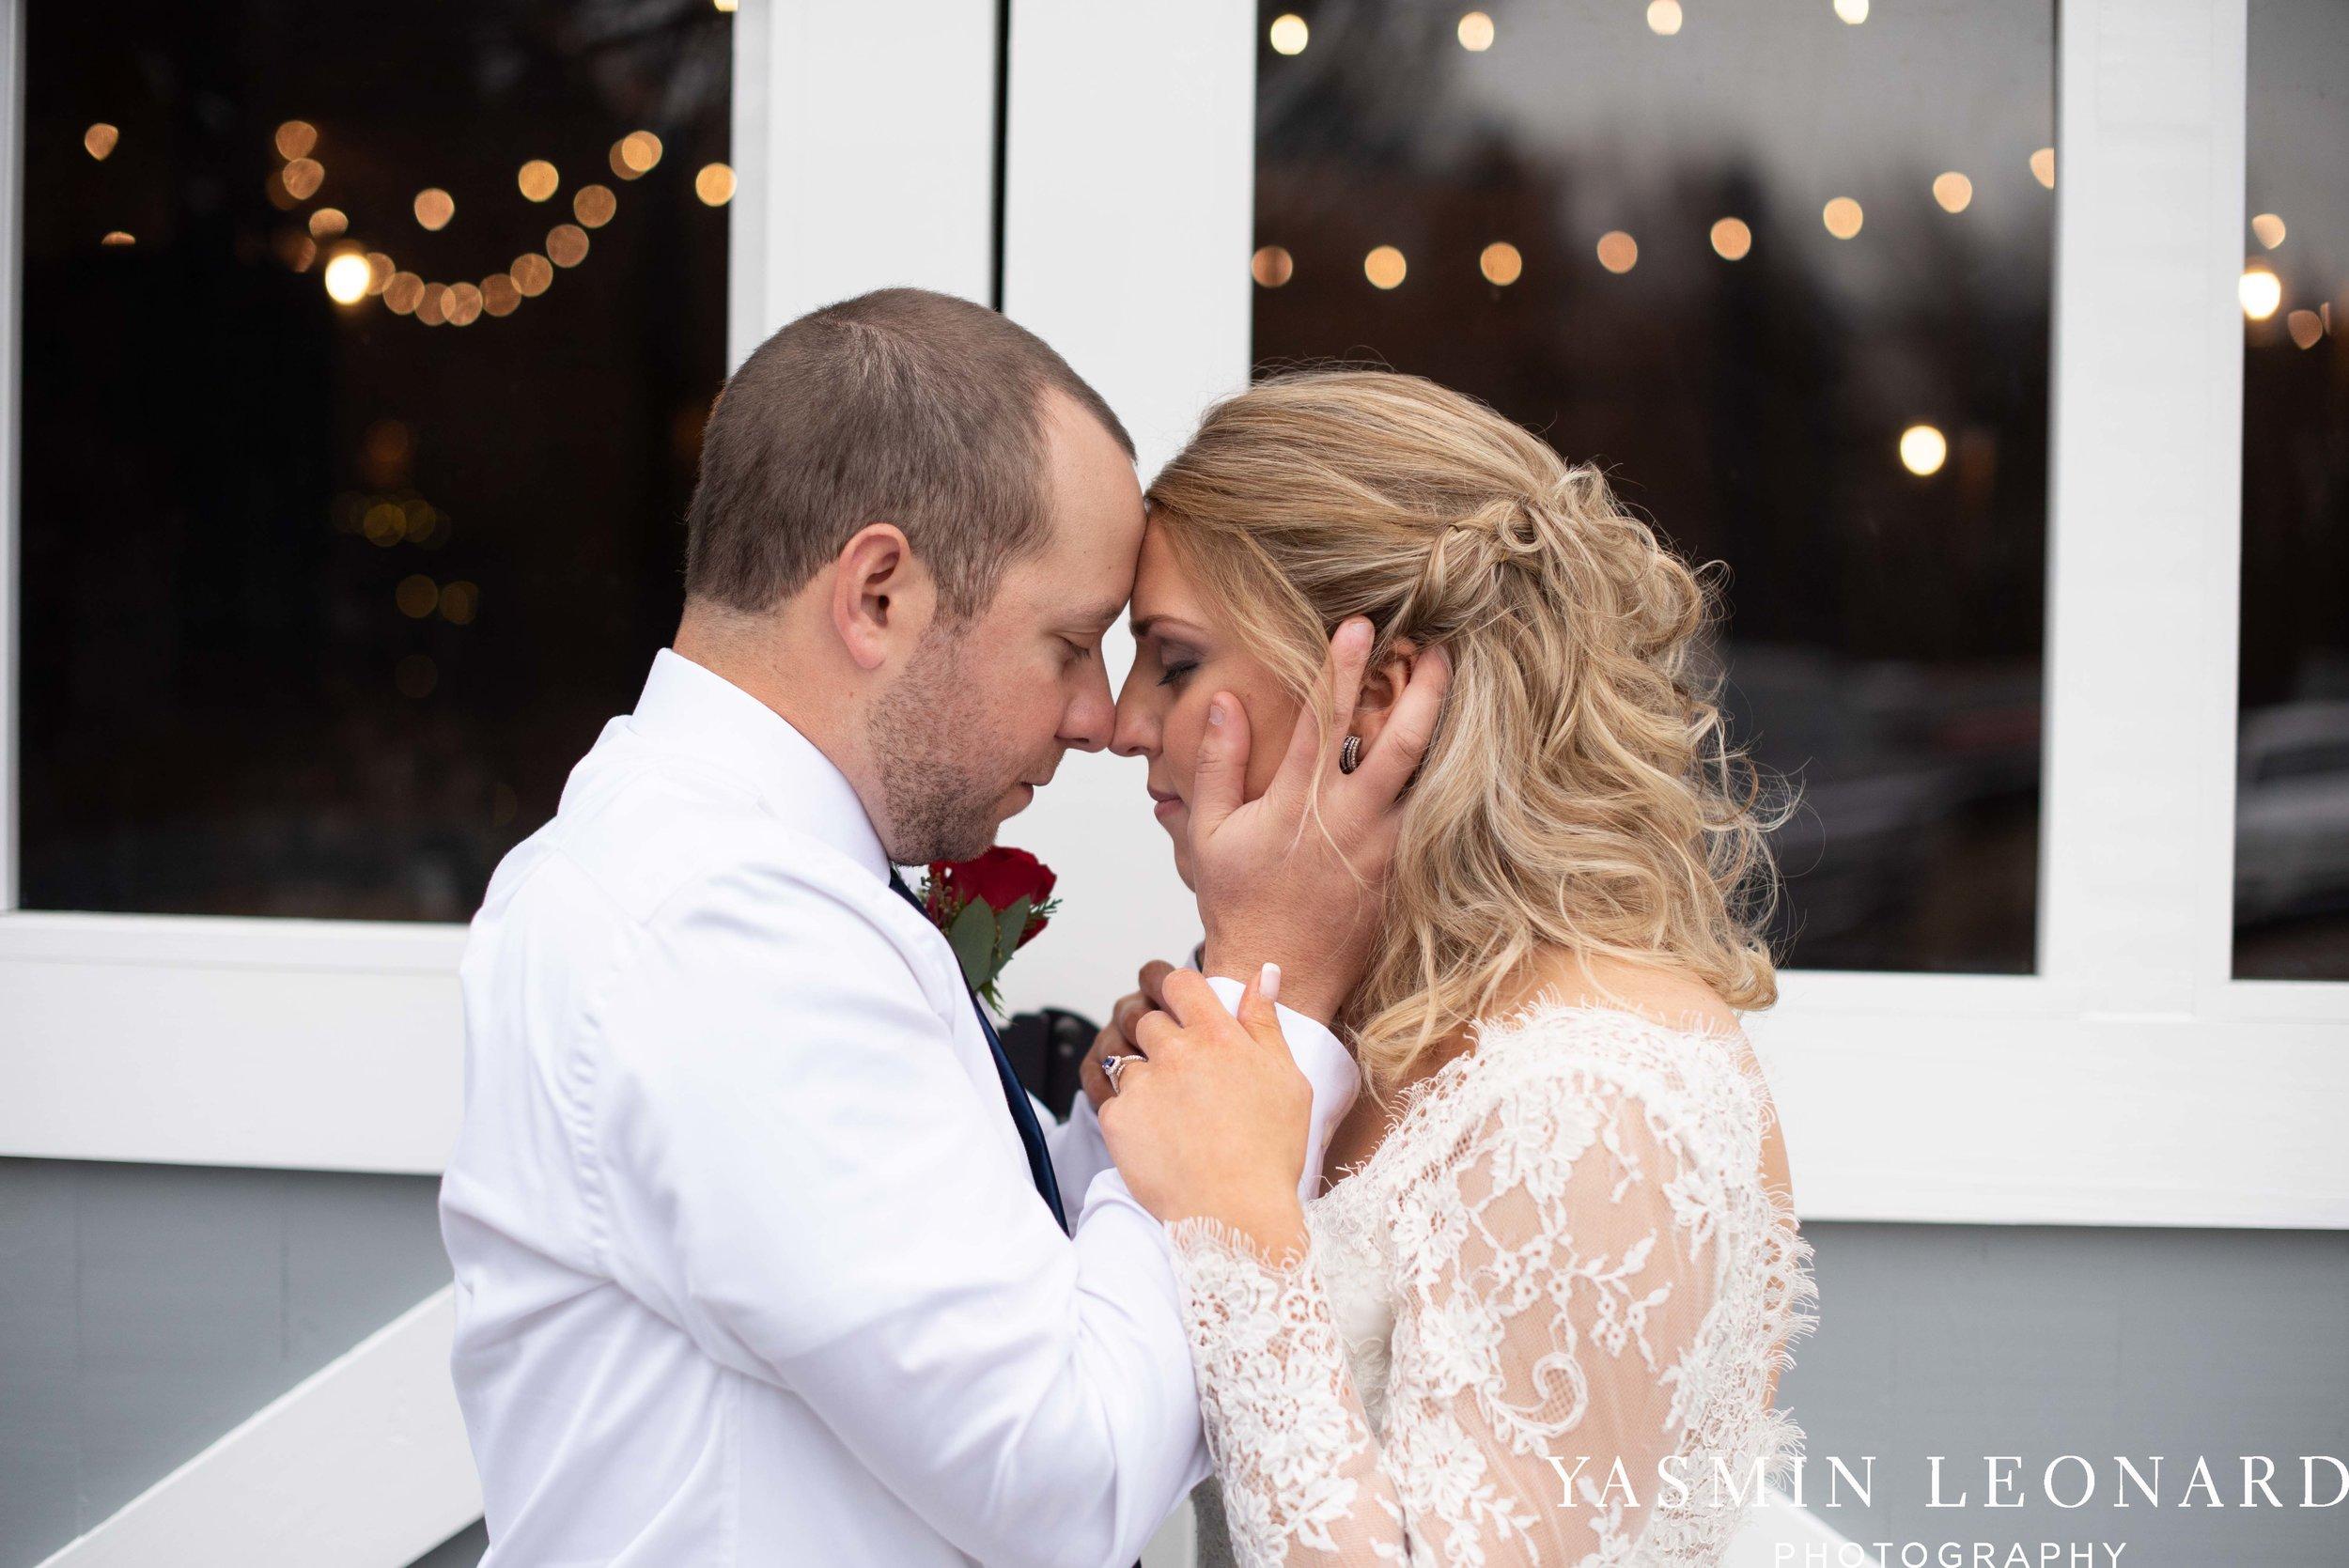 Secret Meadows at Green Dell Farm, NC Barns, NC Wedding Venues, Triad, NC, NC Wedding Photography, Triad Wedding Venues, Affordable Wedding Venues, NEW Wedding Venues, Christmas Weddings-37.jpg